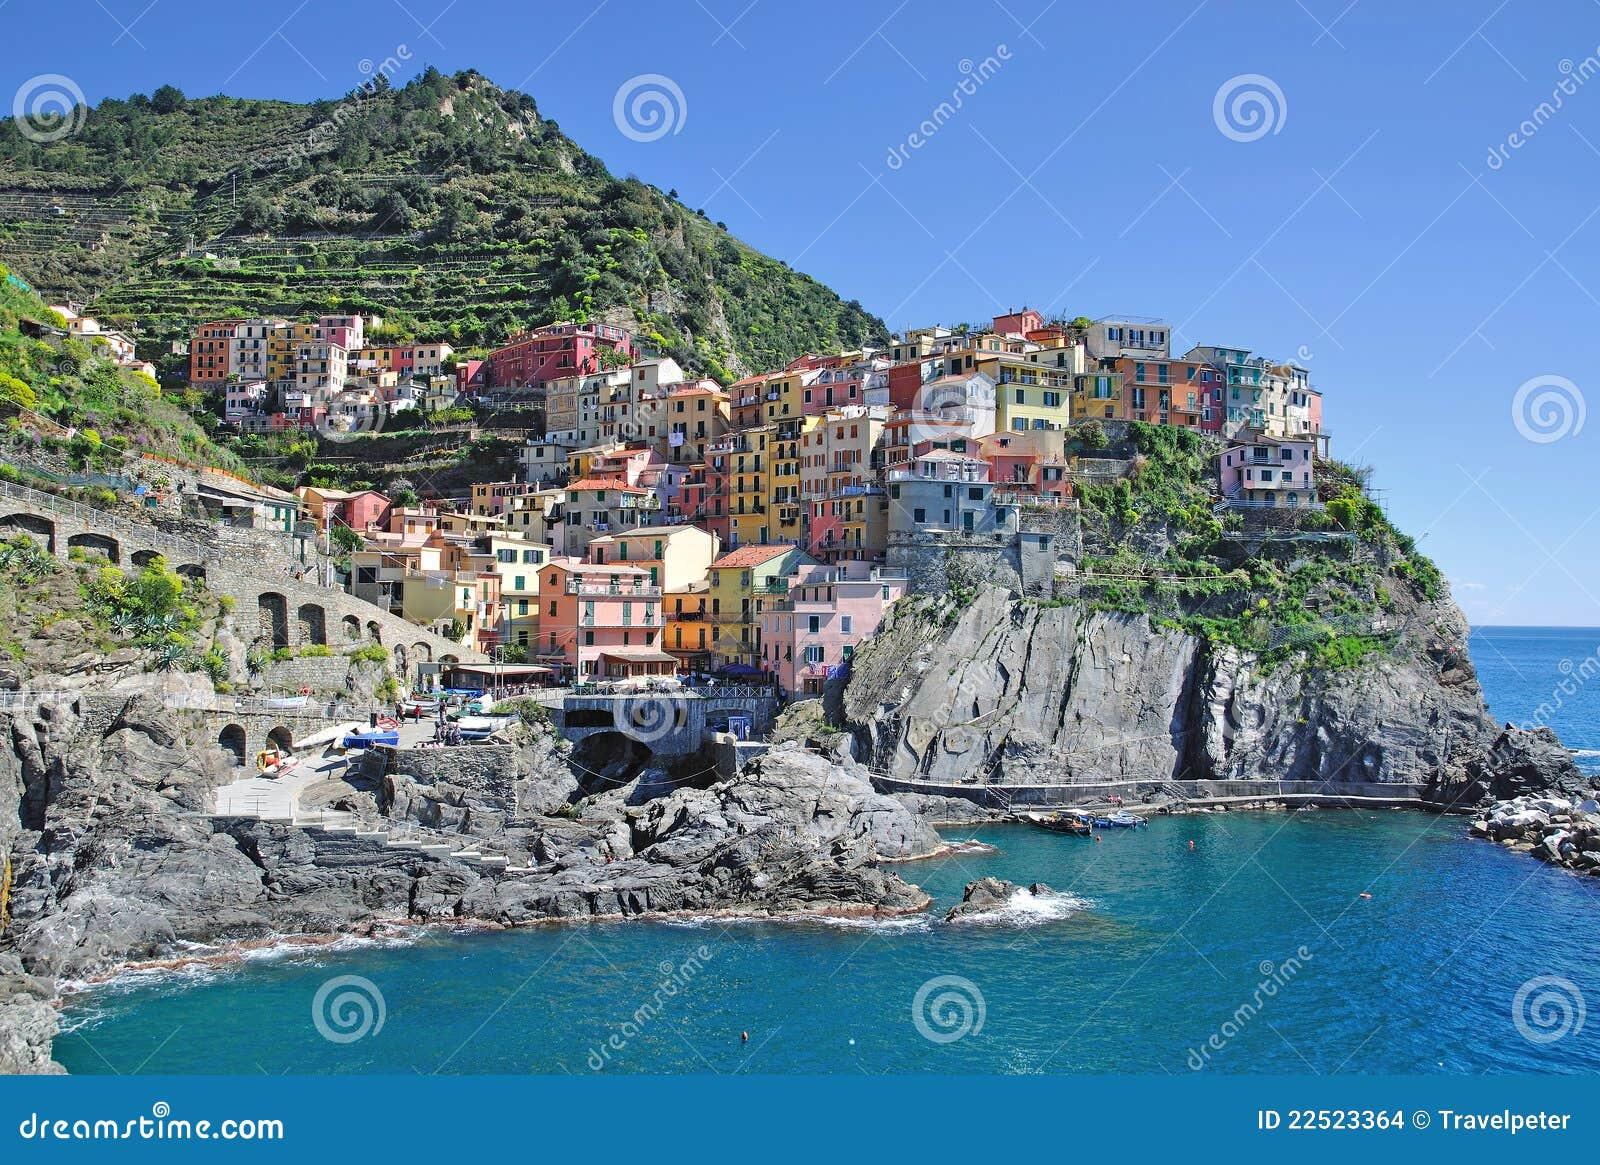 The picturesque village of manarola in the cinque terre on the italian